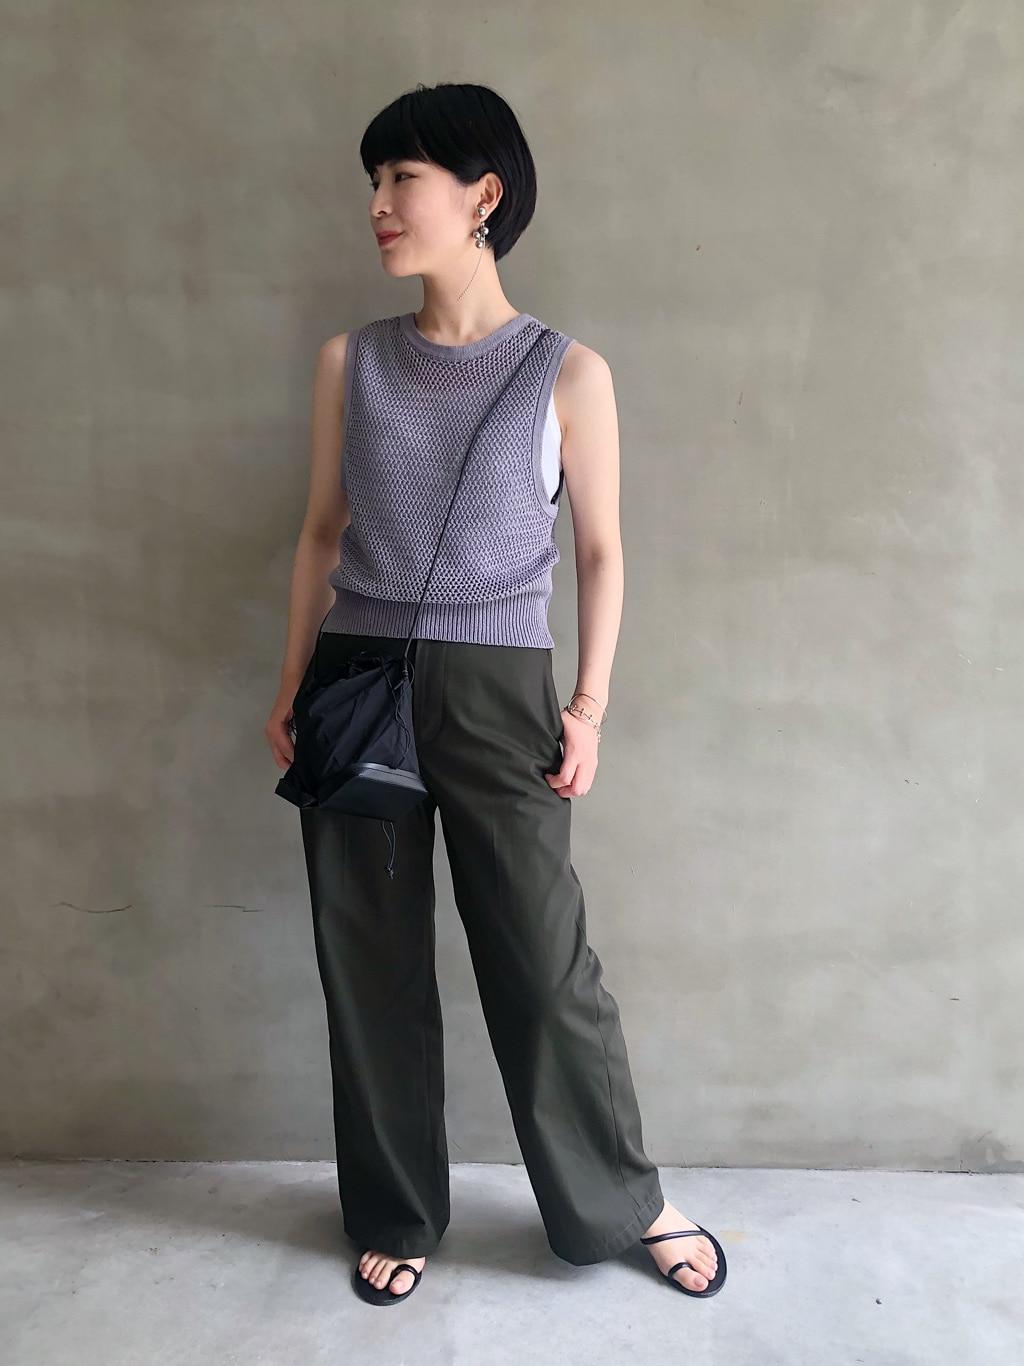 caph troupe 福岡薬院路面 身長:155cm 2020.07.19